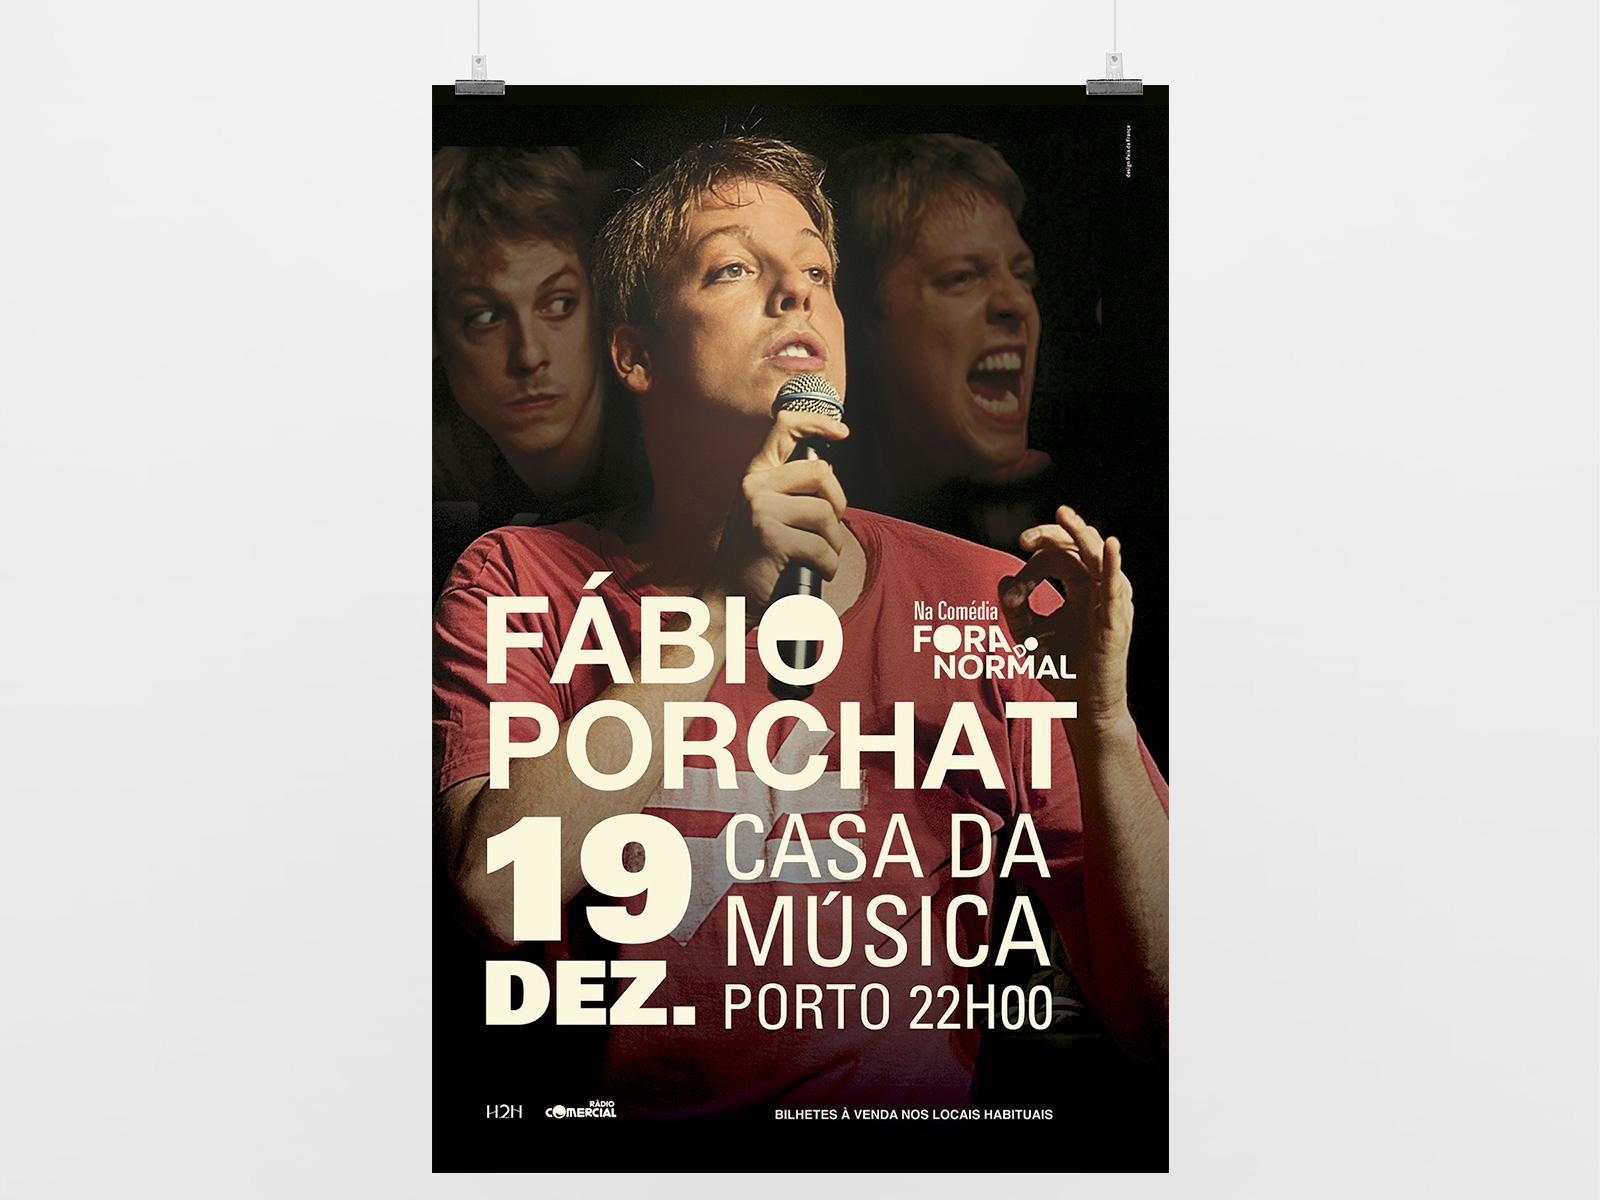 FÁBIO PORCHAT - 1